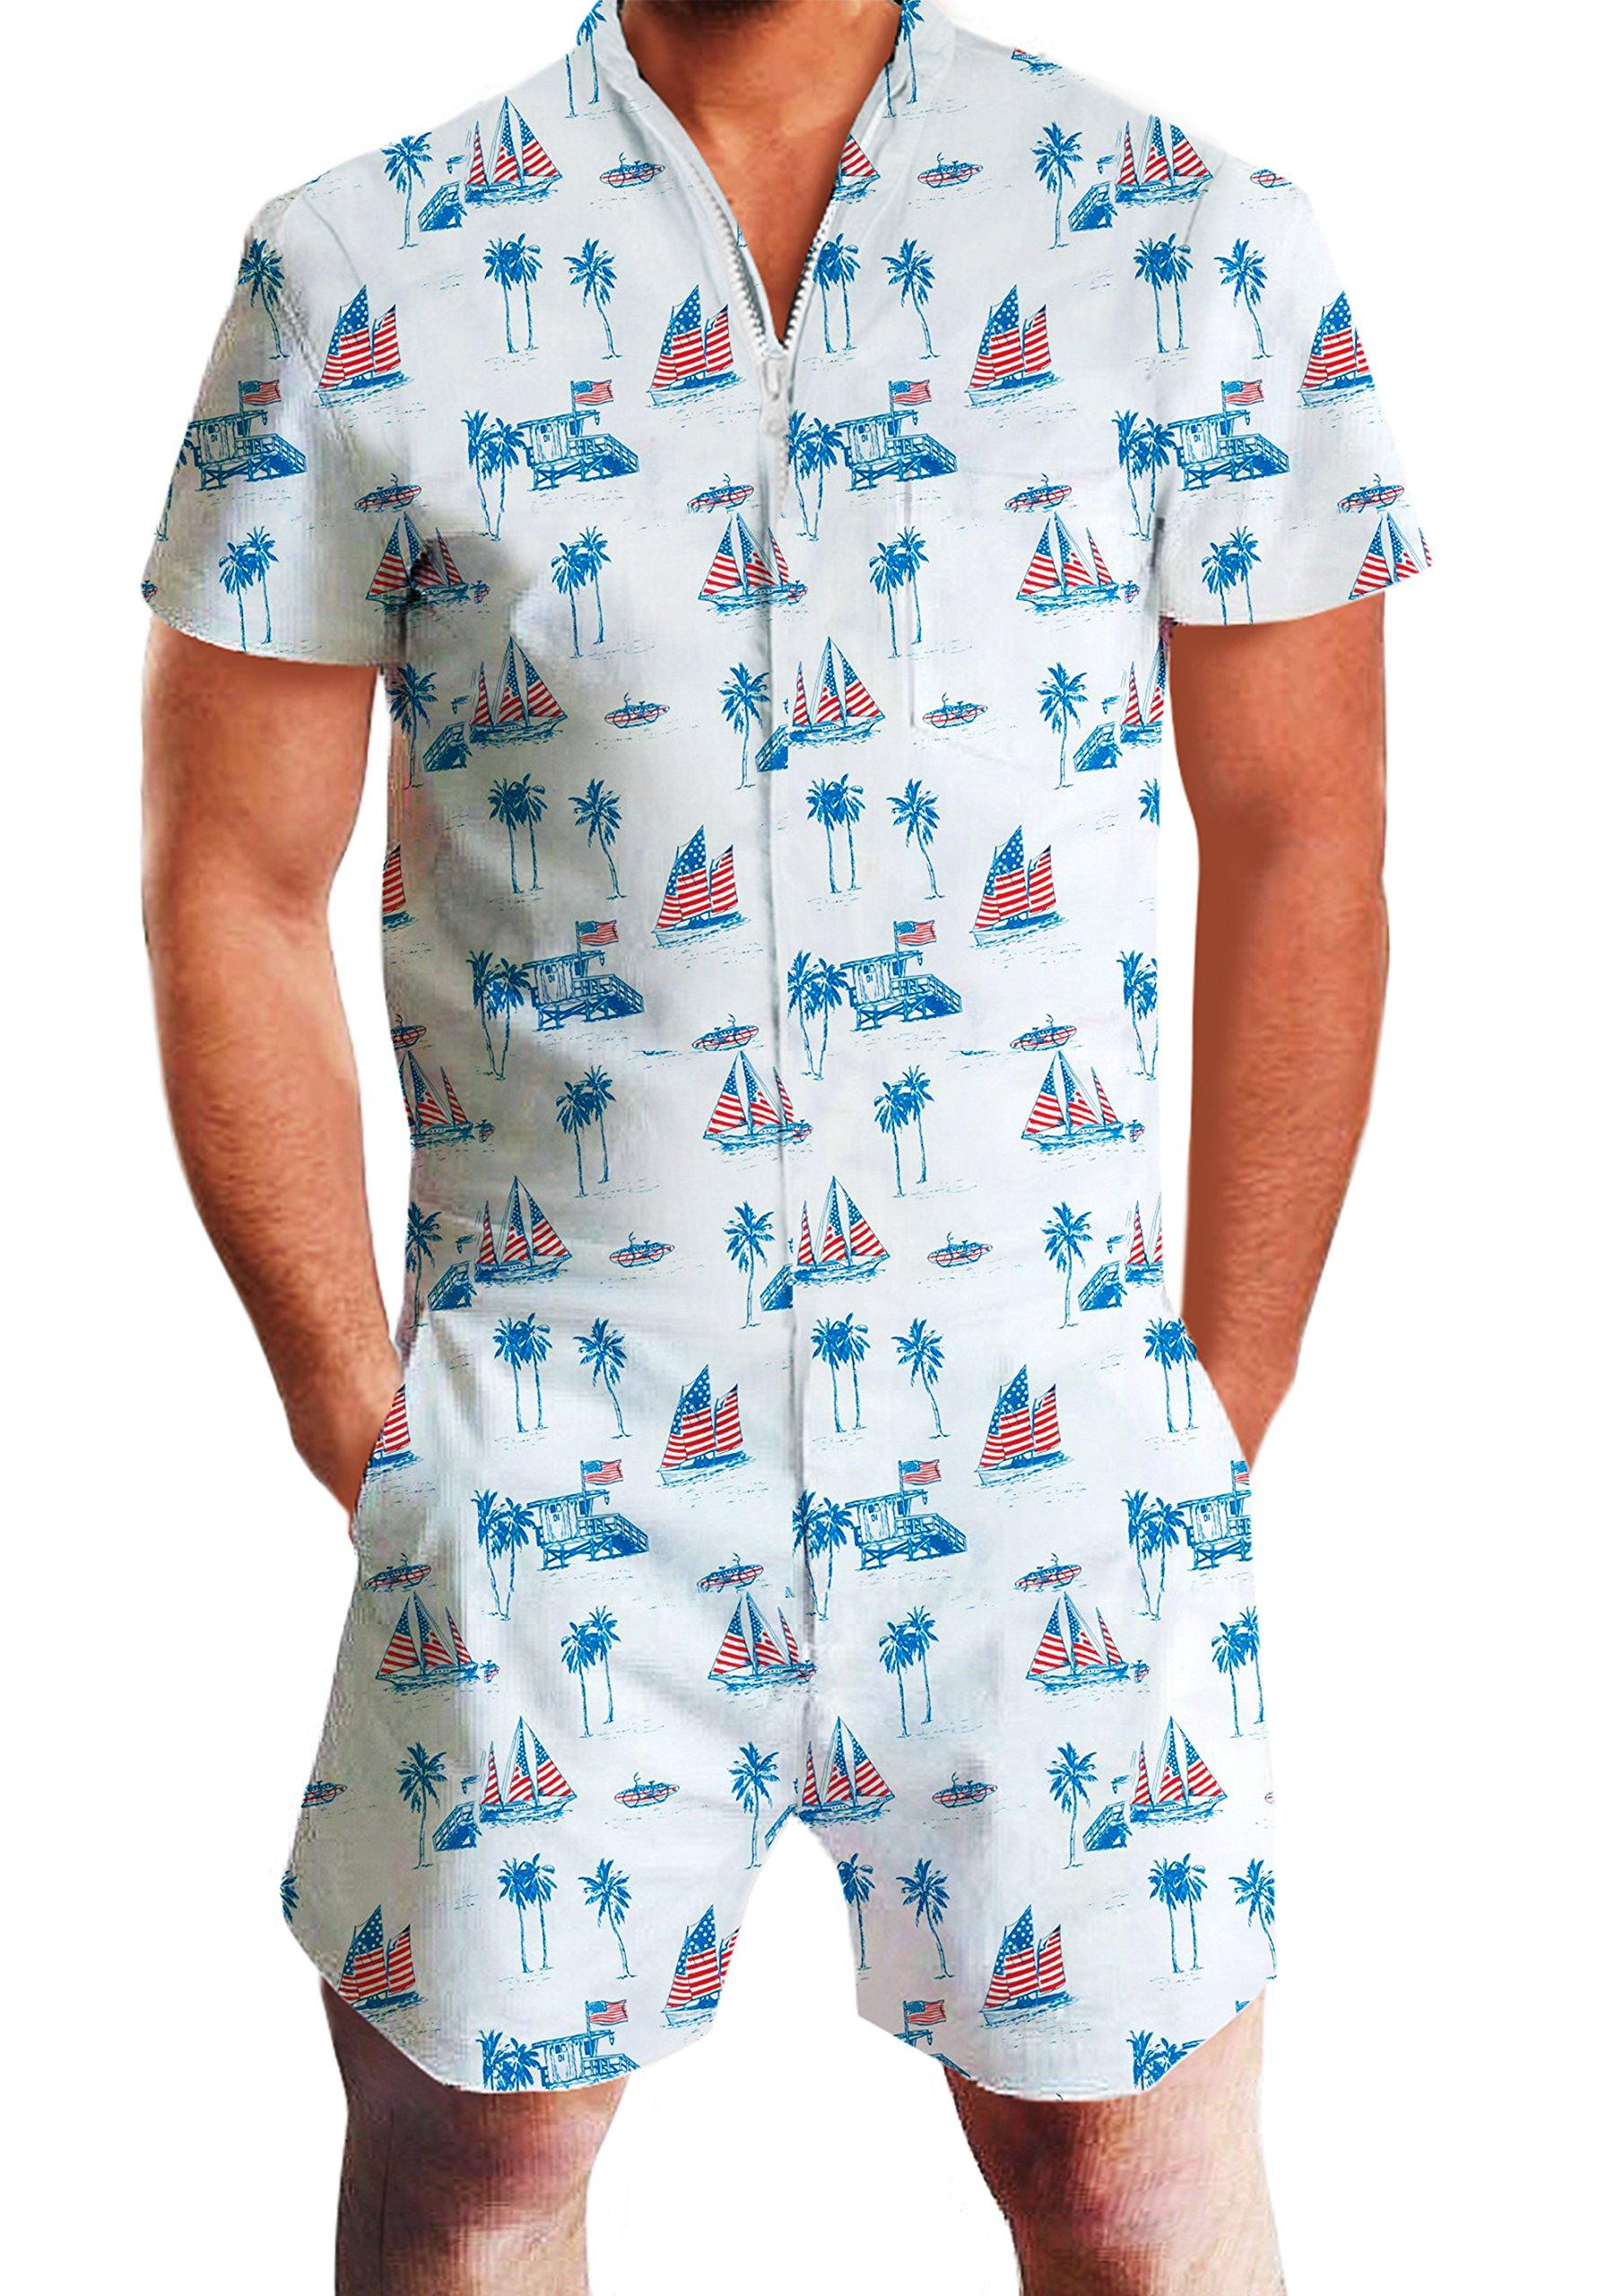 3a09553a86b Galleon - Male Romper Original Men s Romper Jumpsuit Costume 3D Graphic  Milk Personalized Short Sleeve Playsuit Overalls One Piece Slim Fit Surfing  XXL